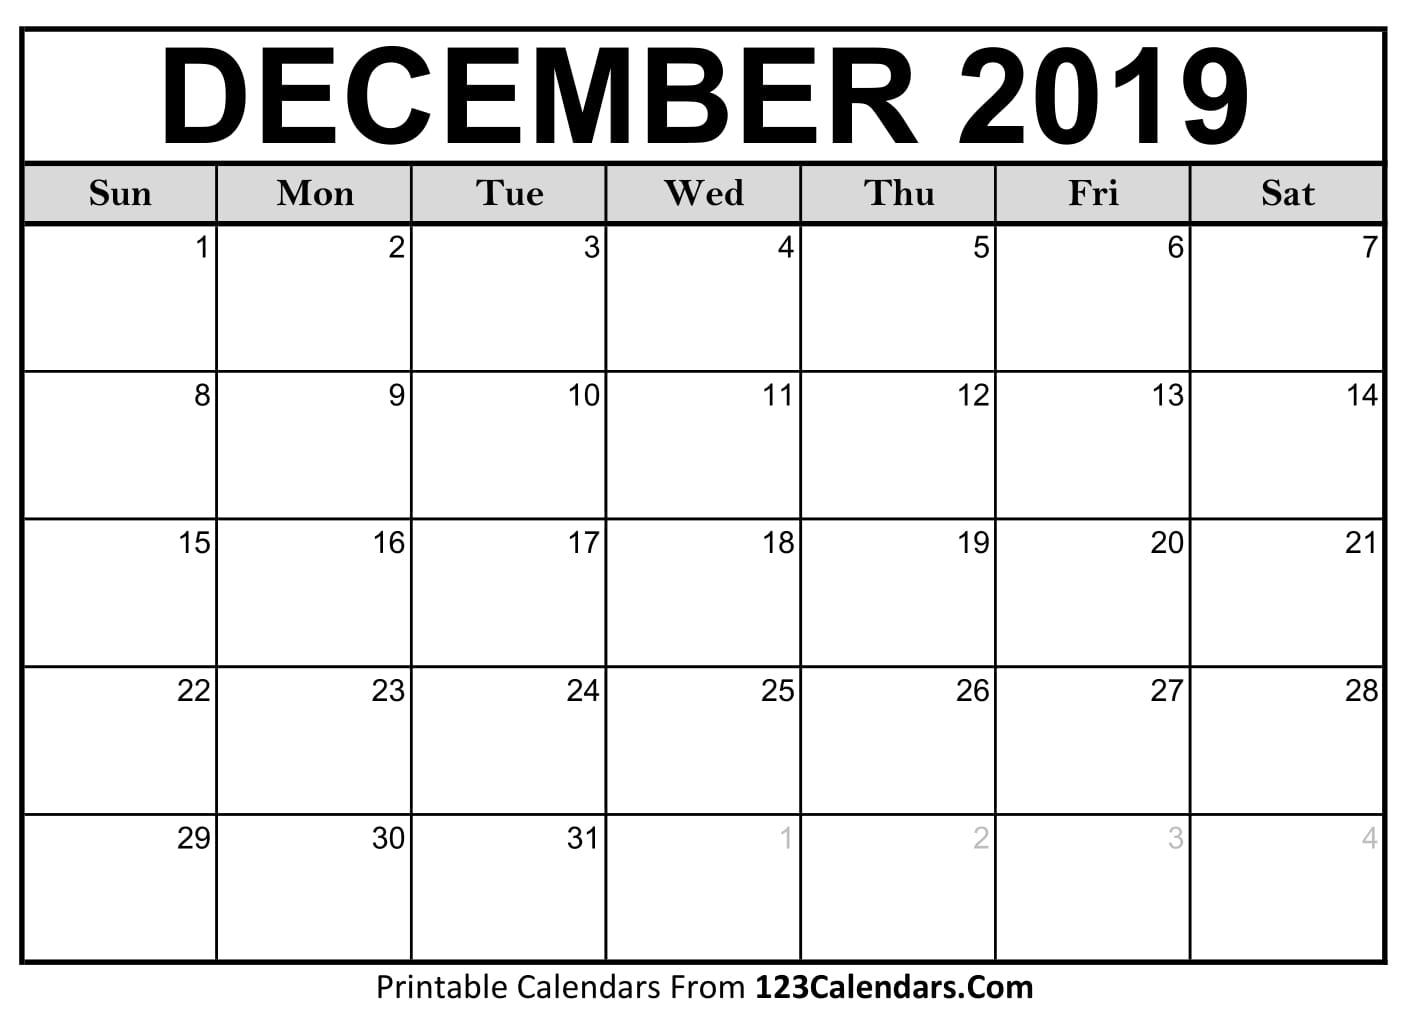 December 2019 Printable Calendar   123Calendars regarding Free Printable September Blank Calendars With Christian Themes